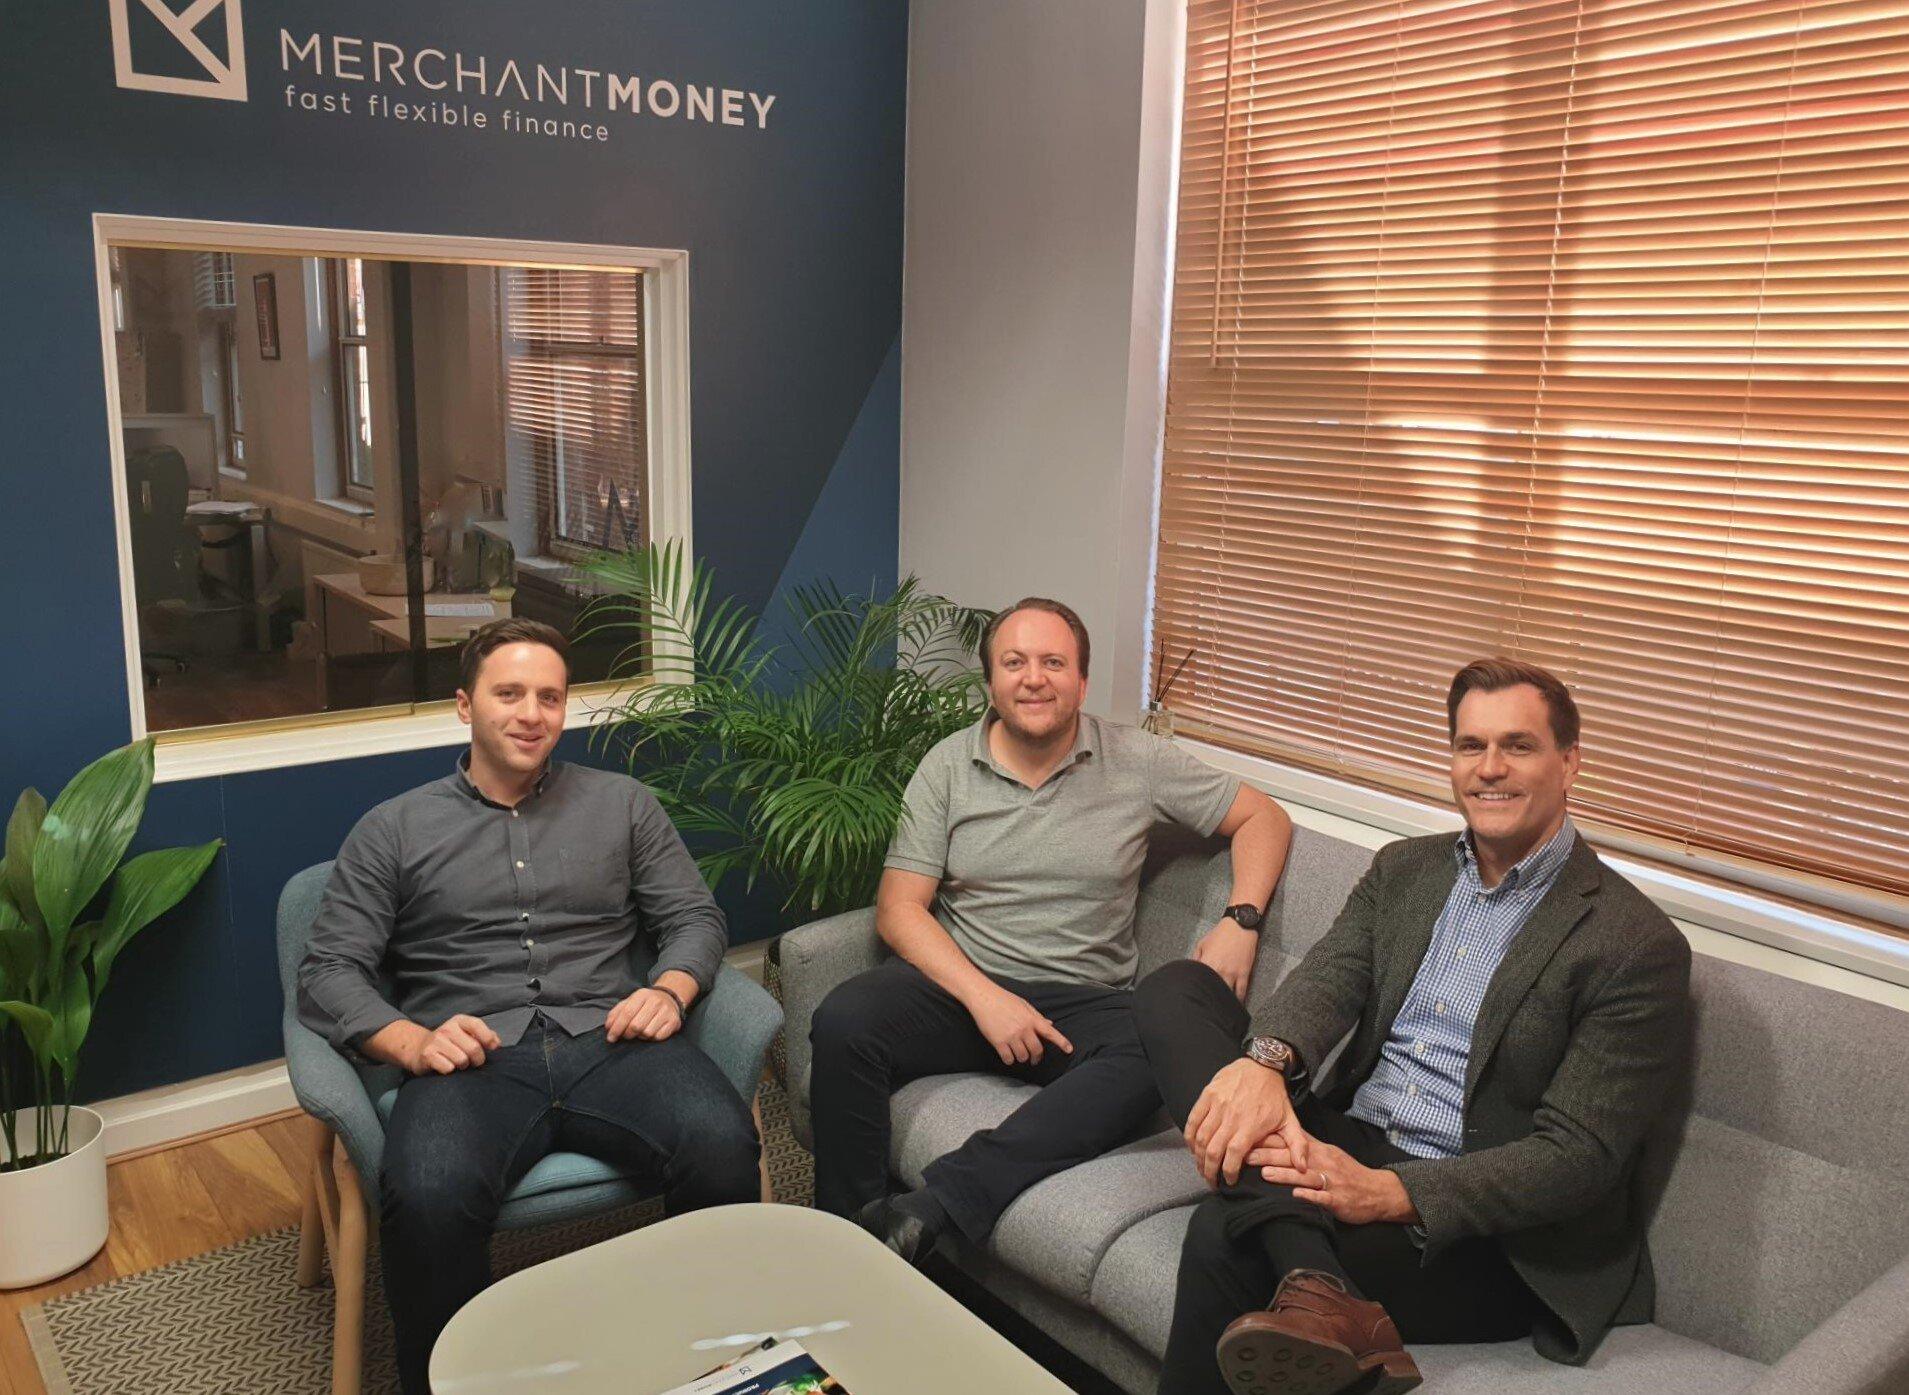 Merchant Money hires ex-Funding Circle Head as new CEO